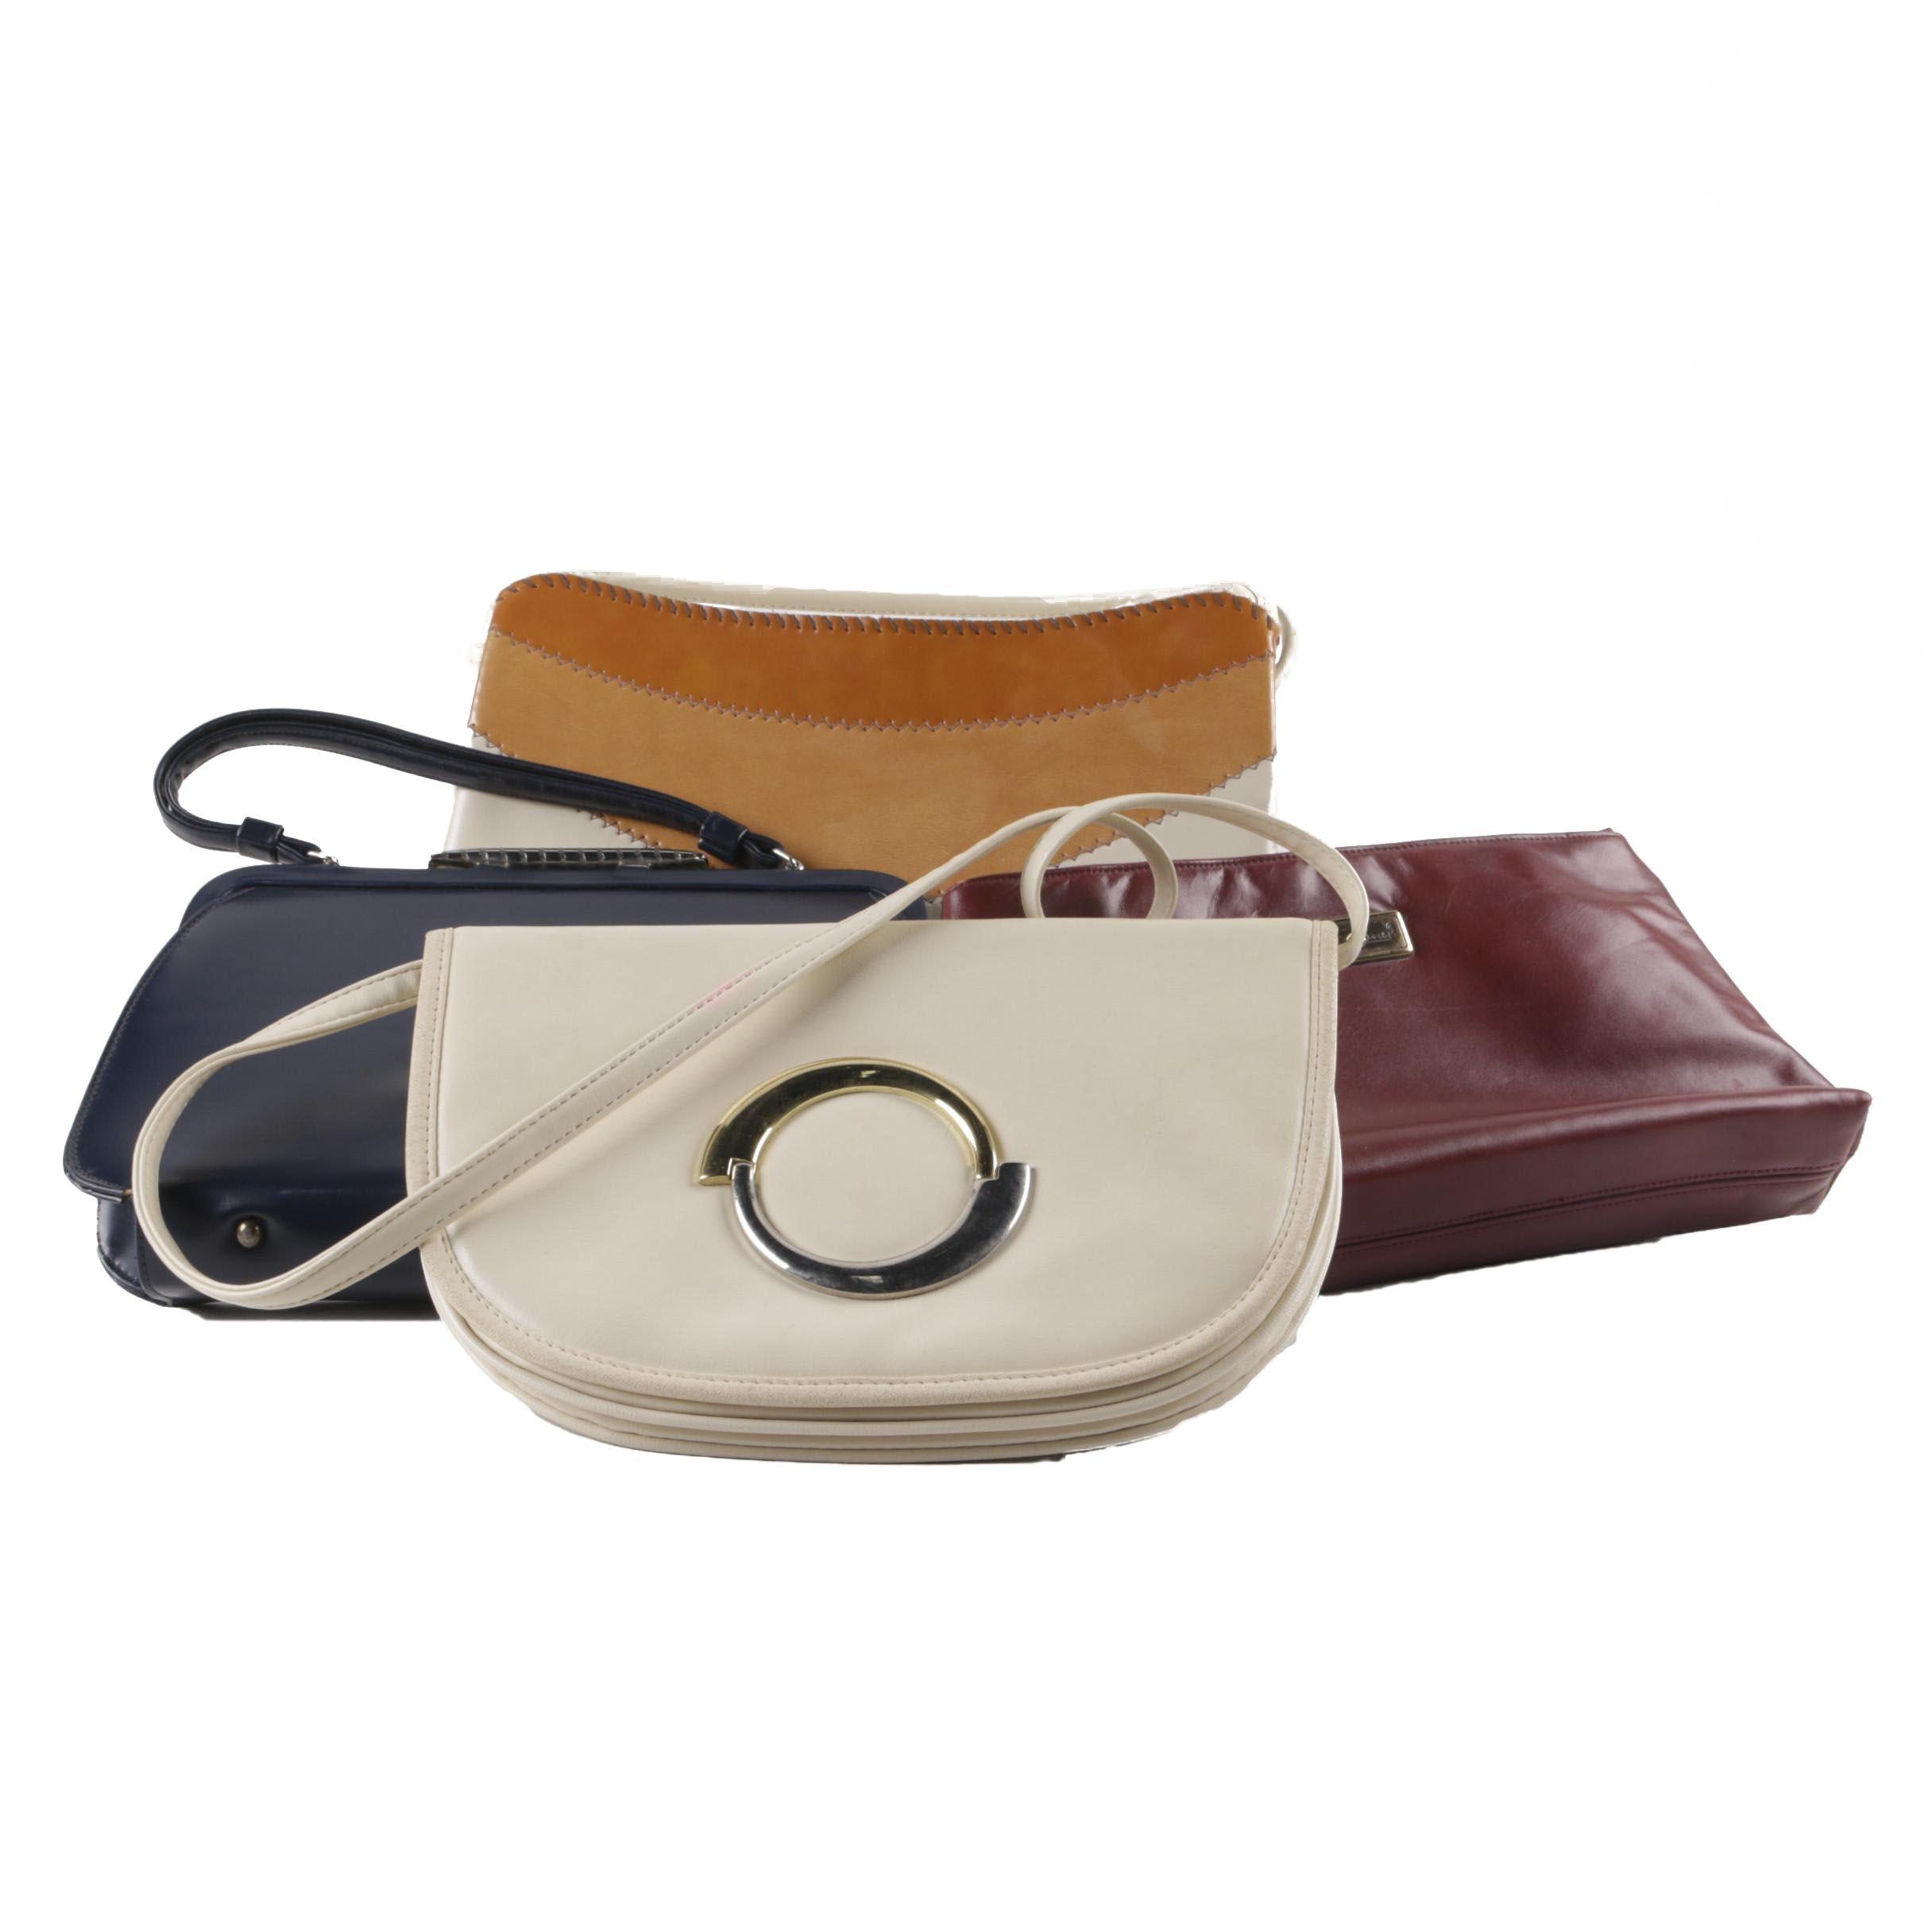 Women's Vintage Leather Handbags Including Etienne Aigner